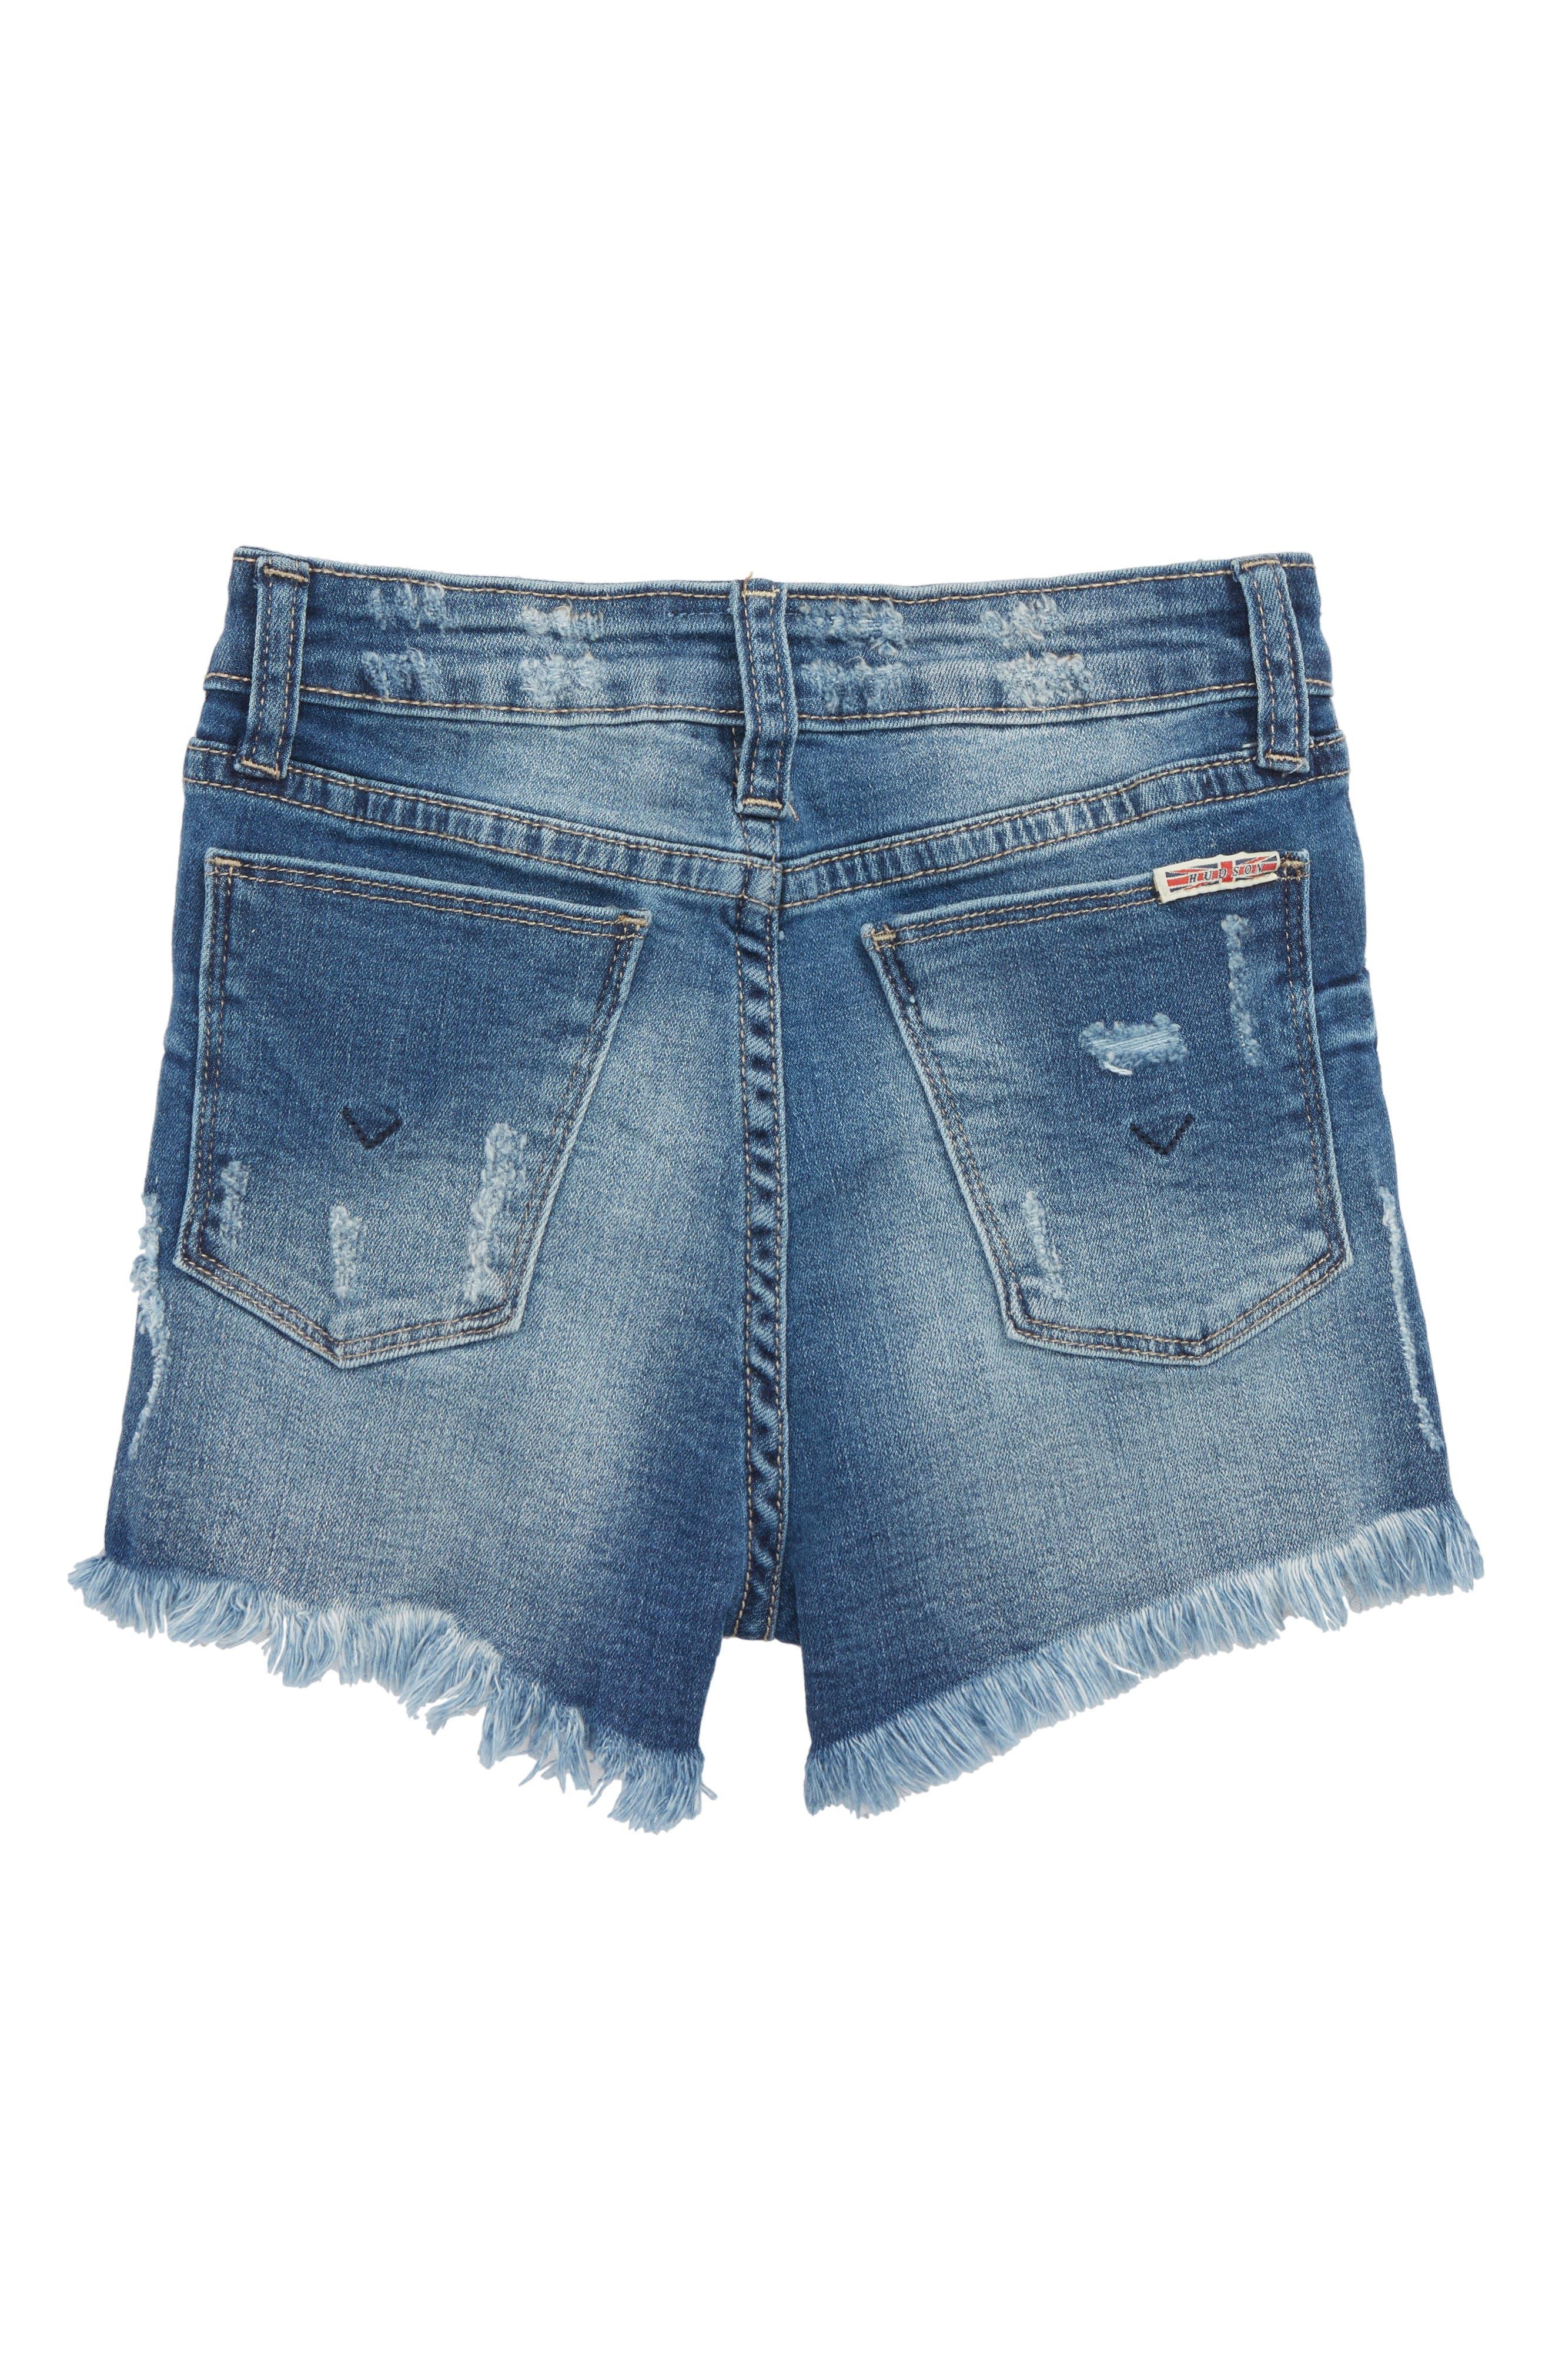 Lily High Waist Cutoff Denim Shorts,                             Alternate thumbnail 2, color,                             499